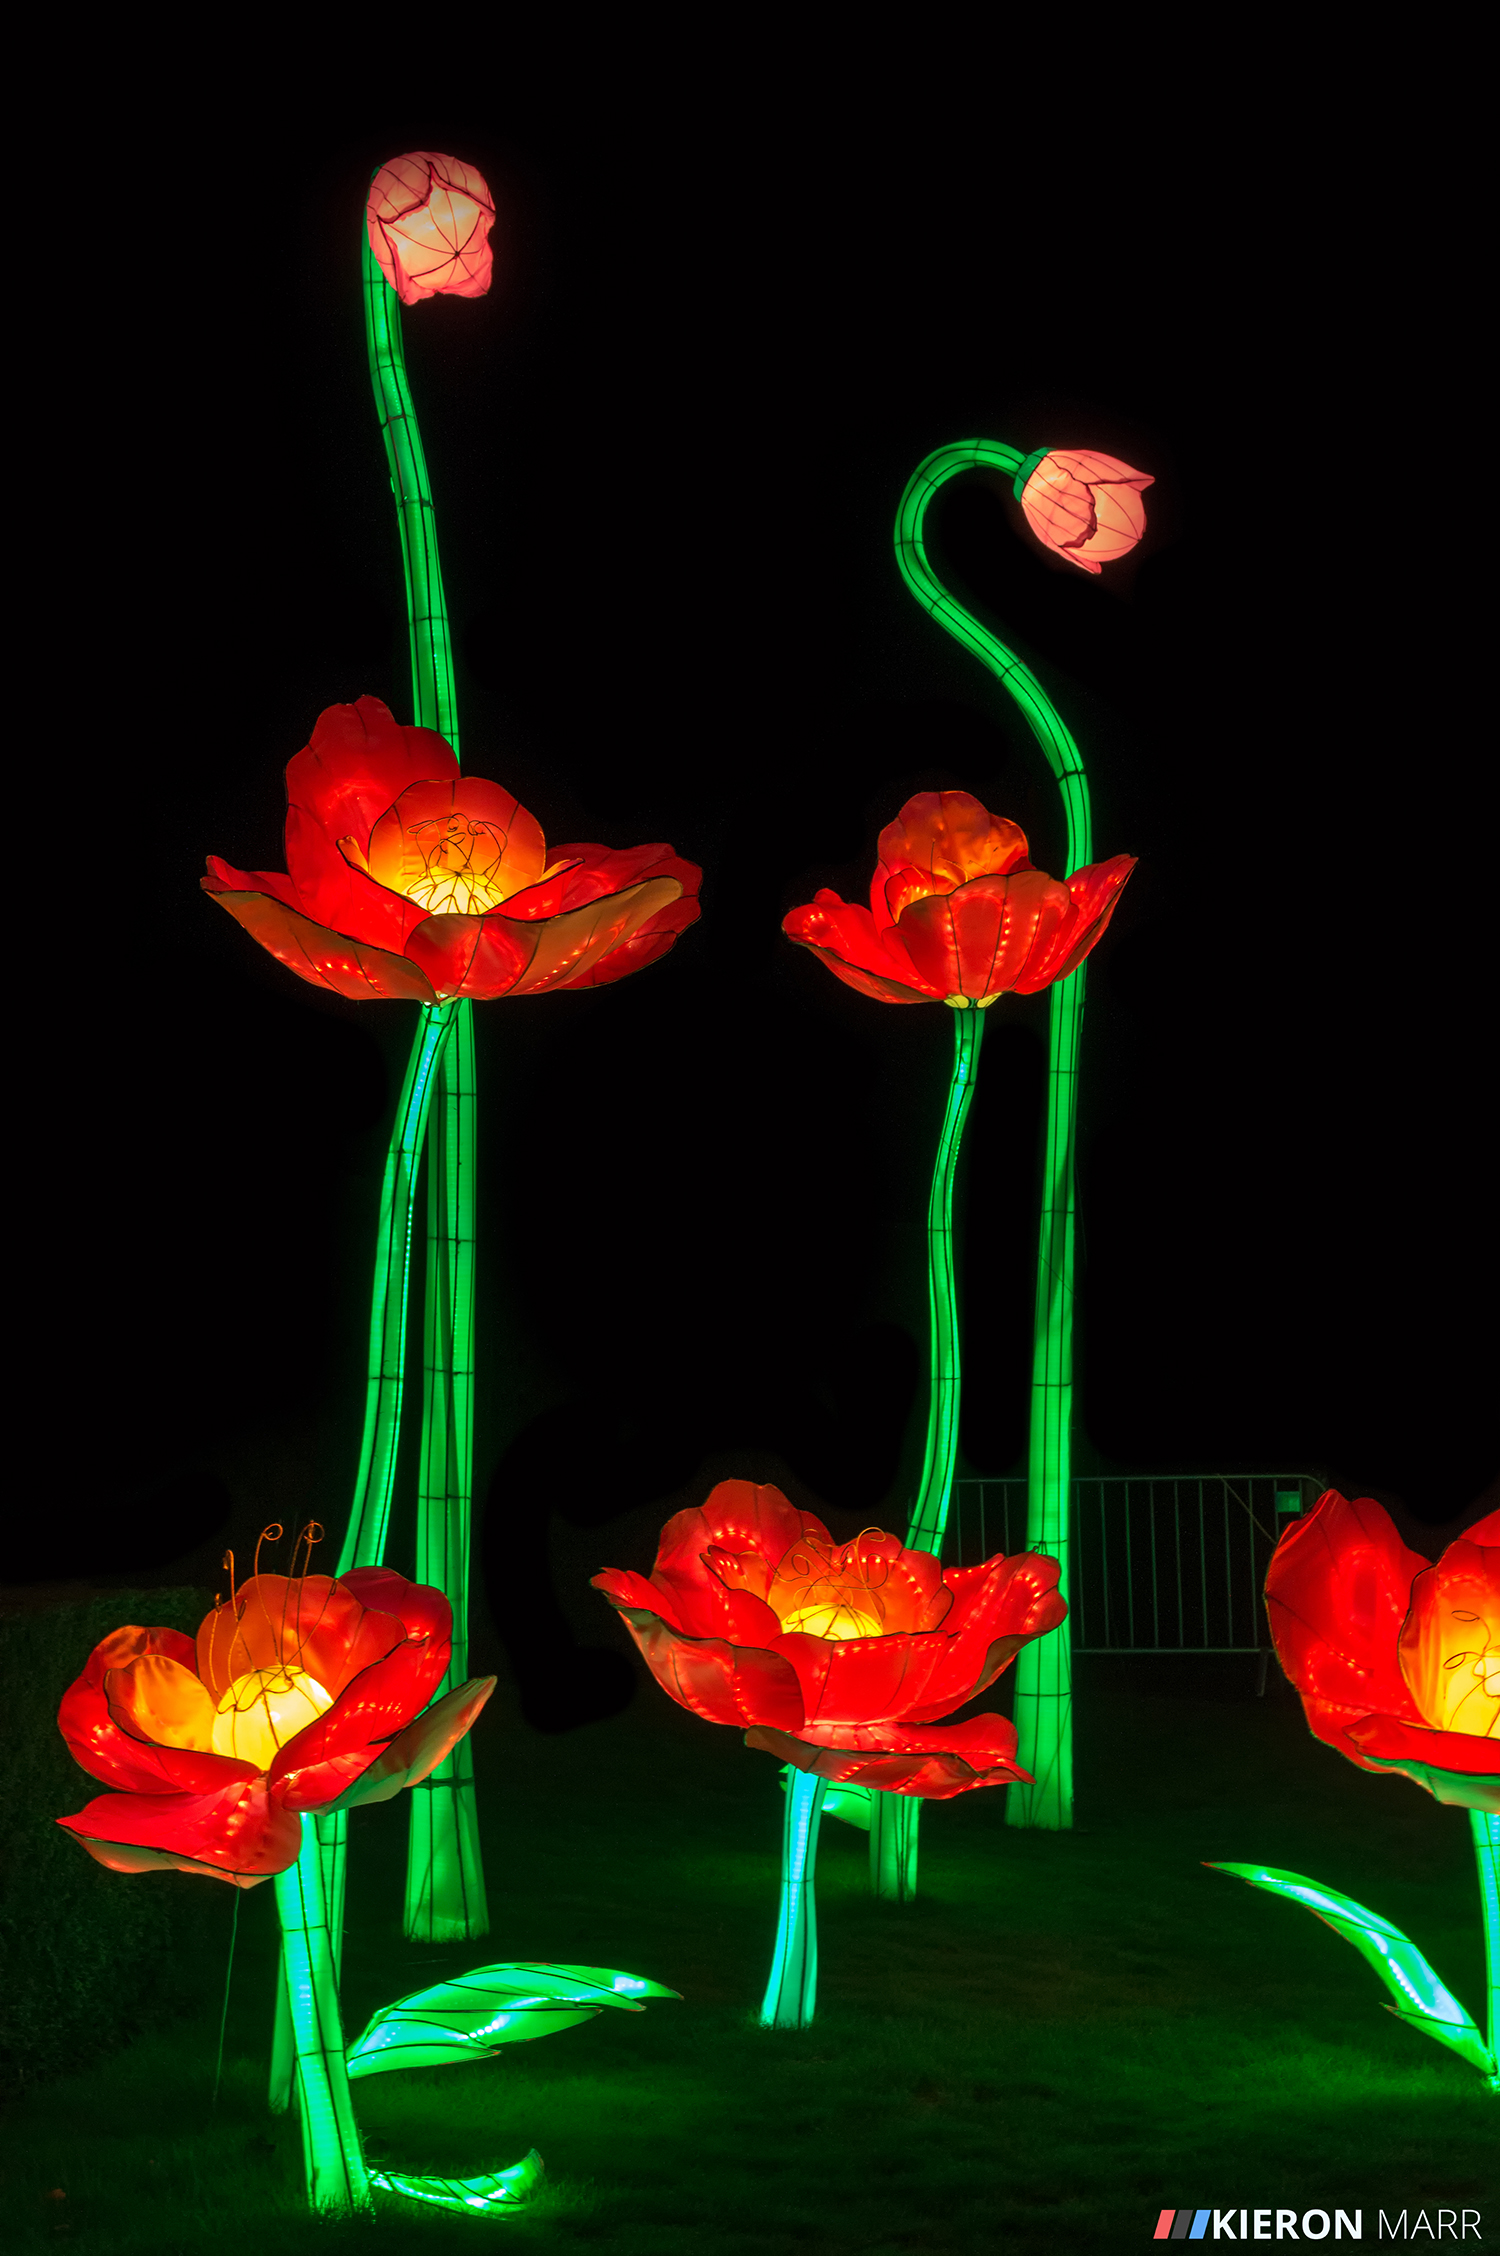 Longleat Festival of Light 2014 - Flowers